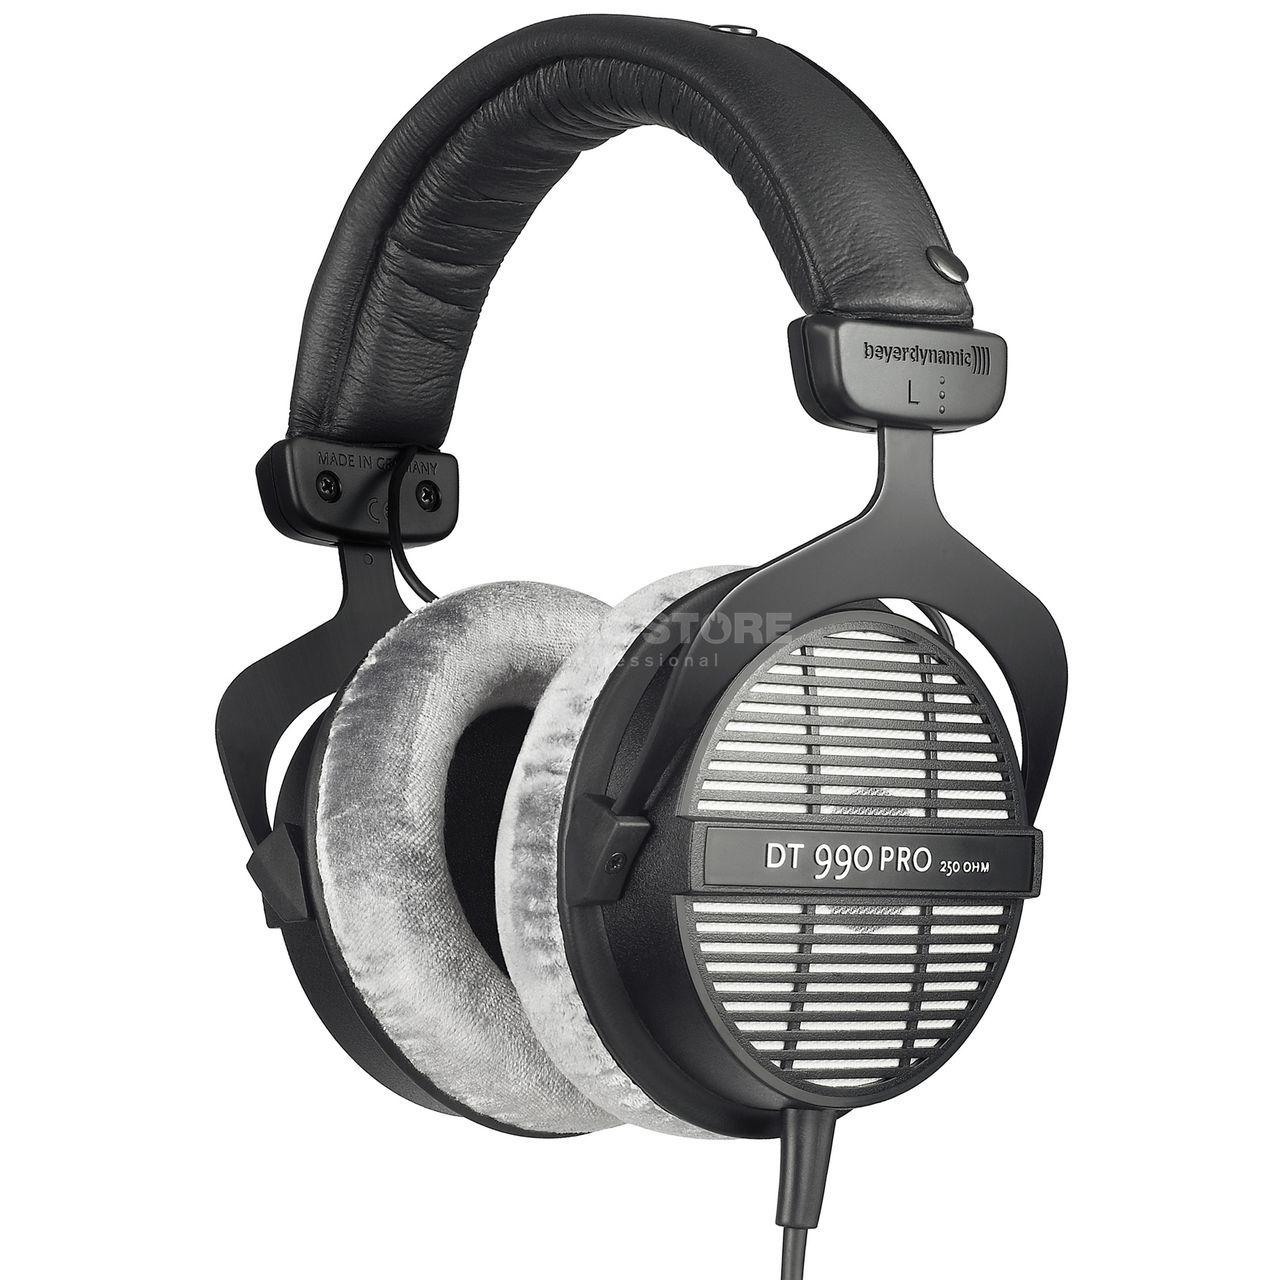 beyerdynamic dt 990 pro 250 ohm open studio headphones dv247 en gb. Black Bedroom Furniture Sets. Home Design Ideas